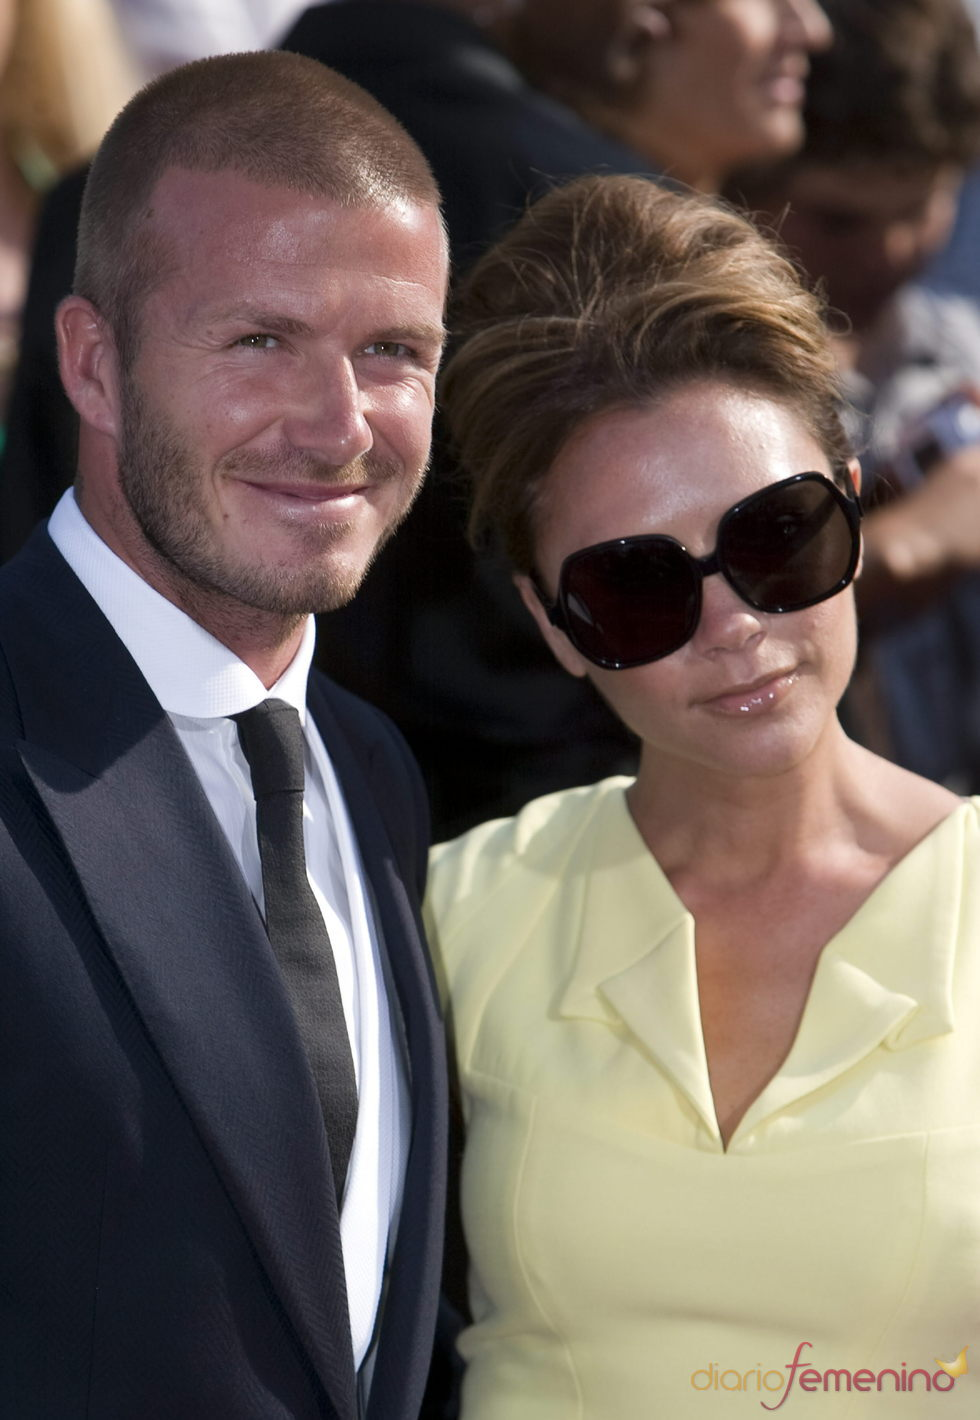 David Beckham anuncia que su esposa, Victoria, espera una niña